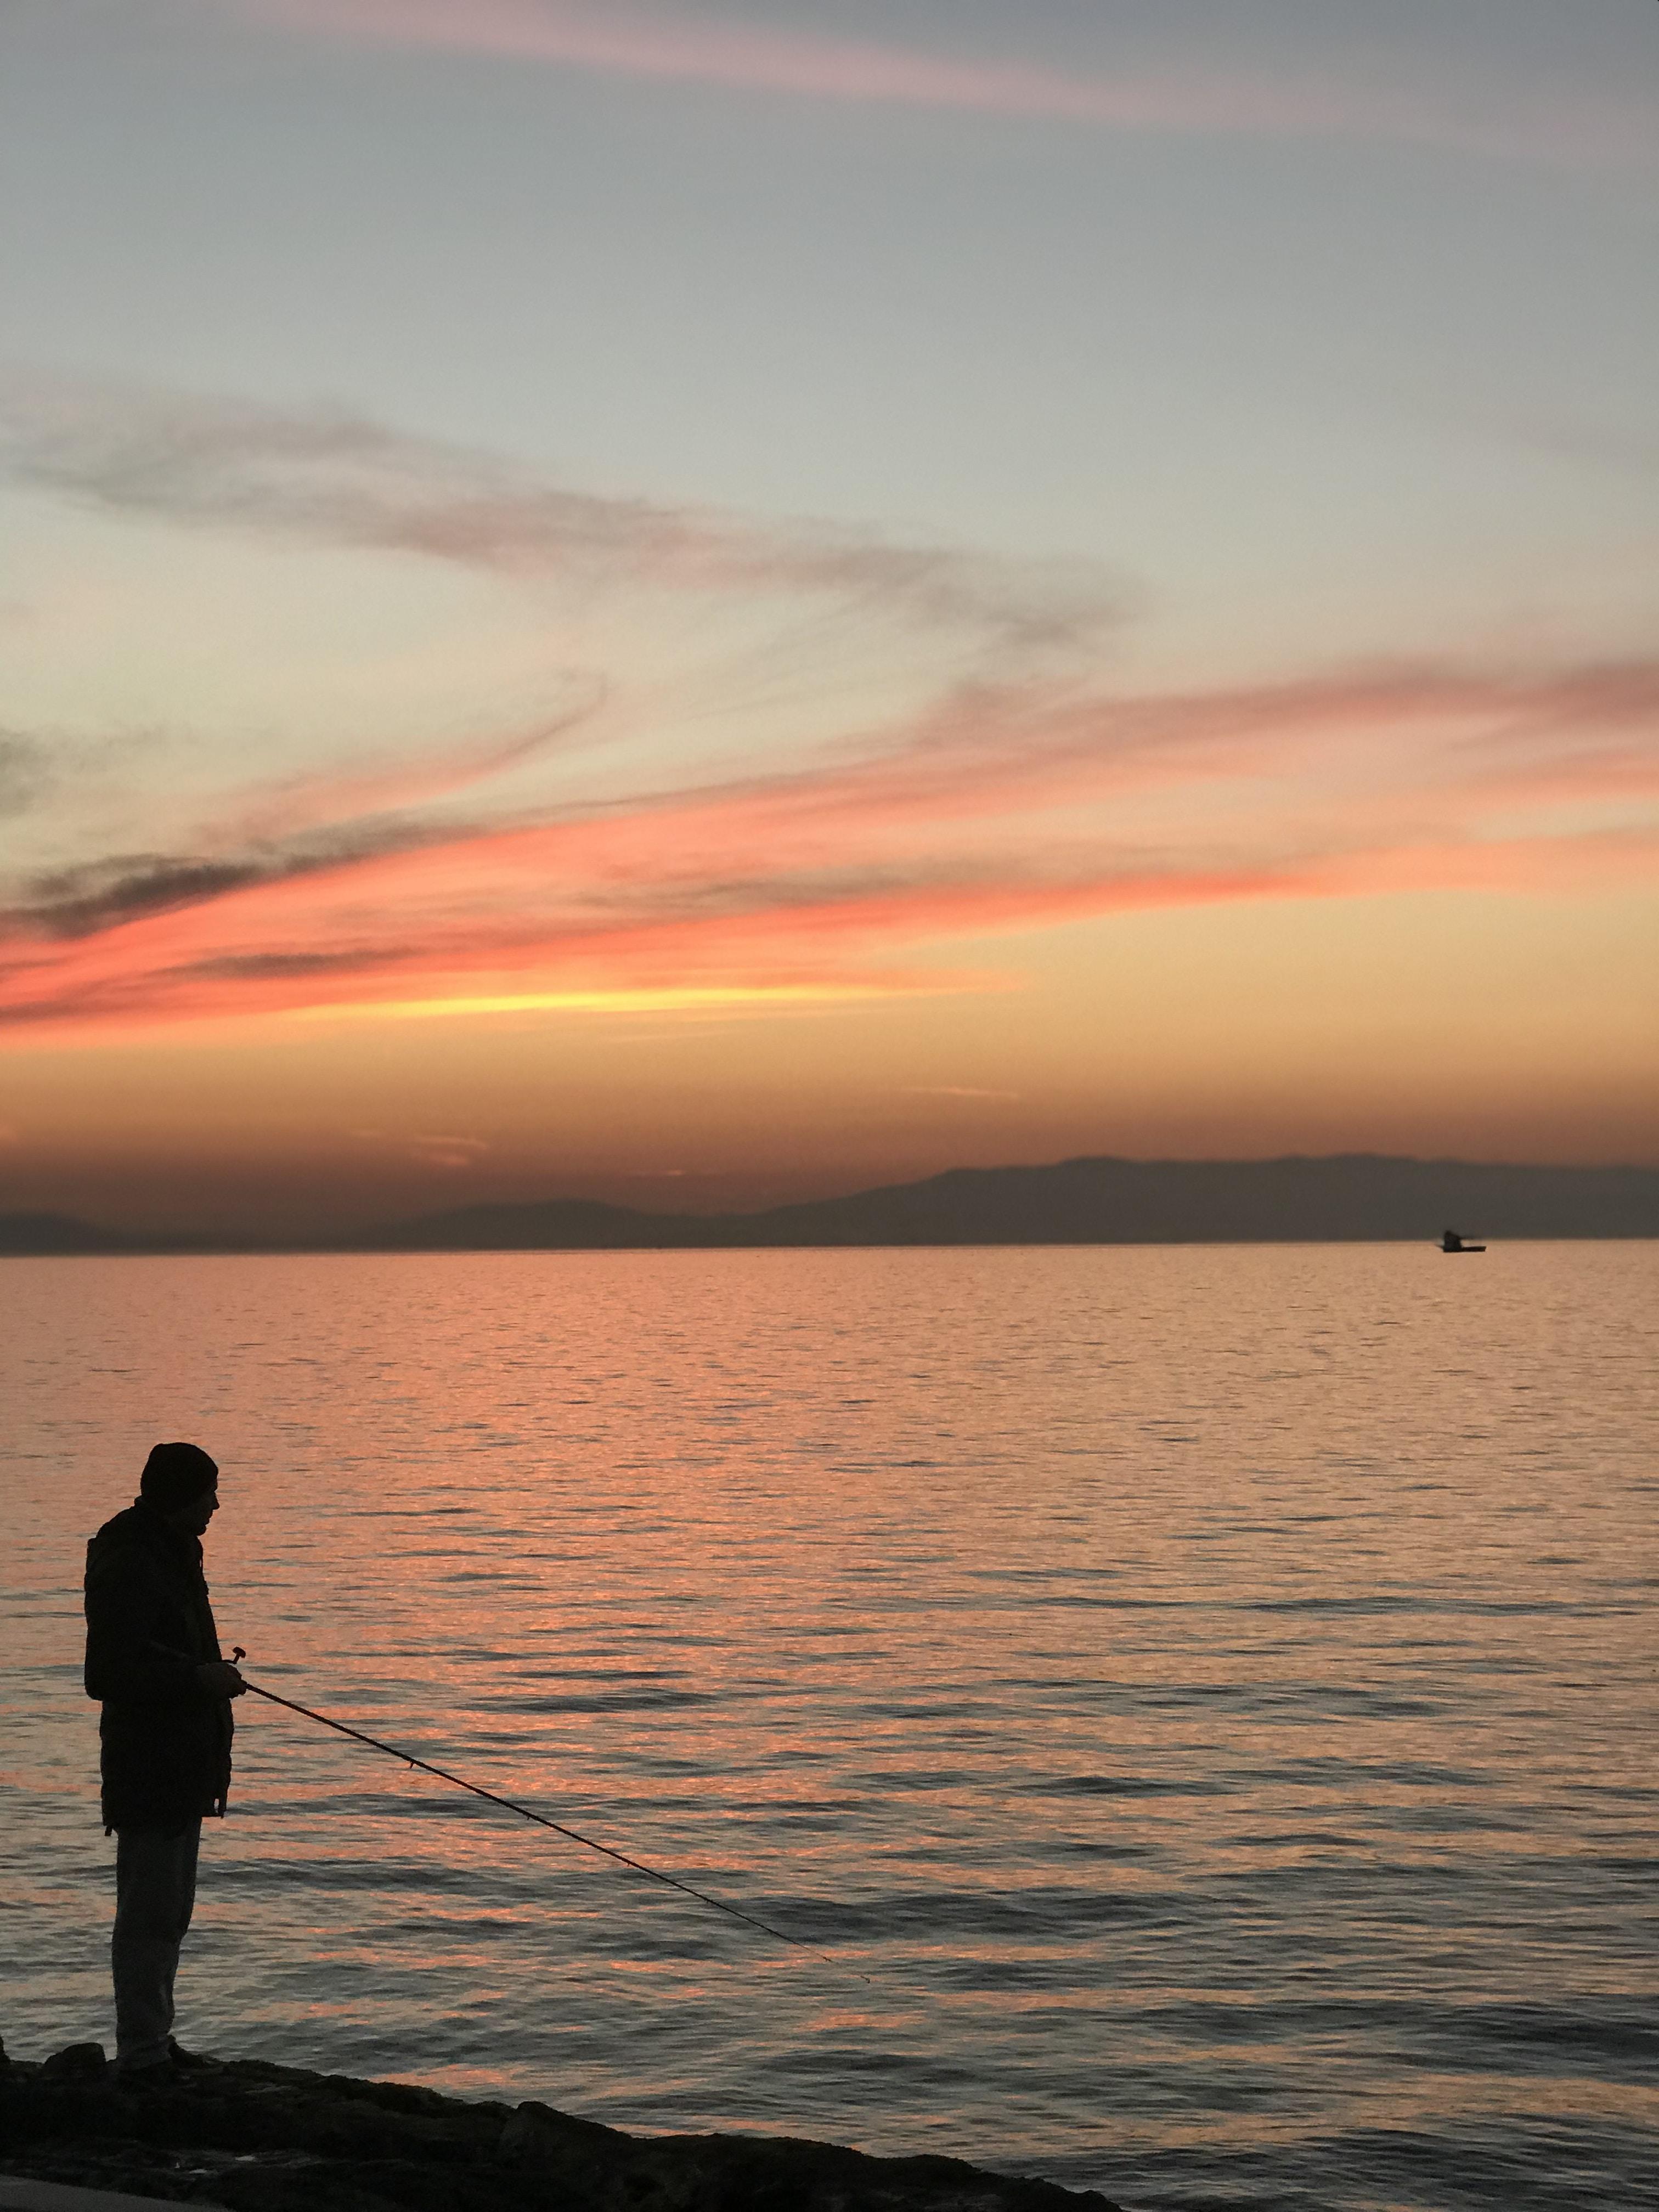 man standing on edge fishing